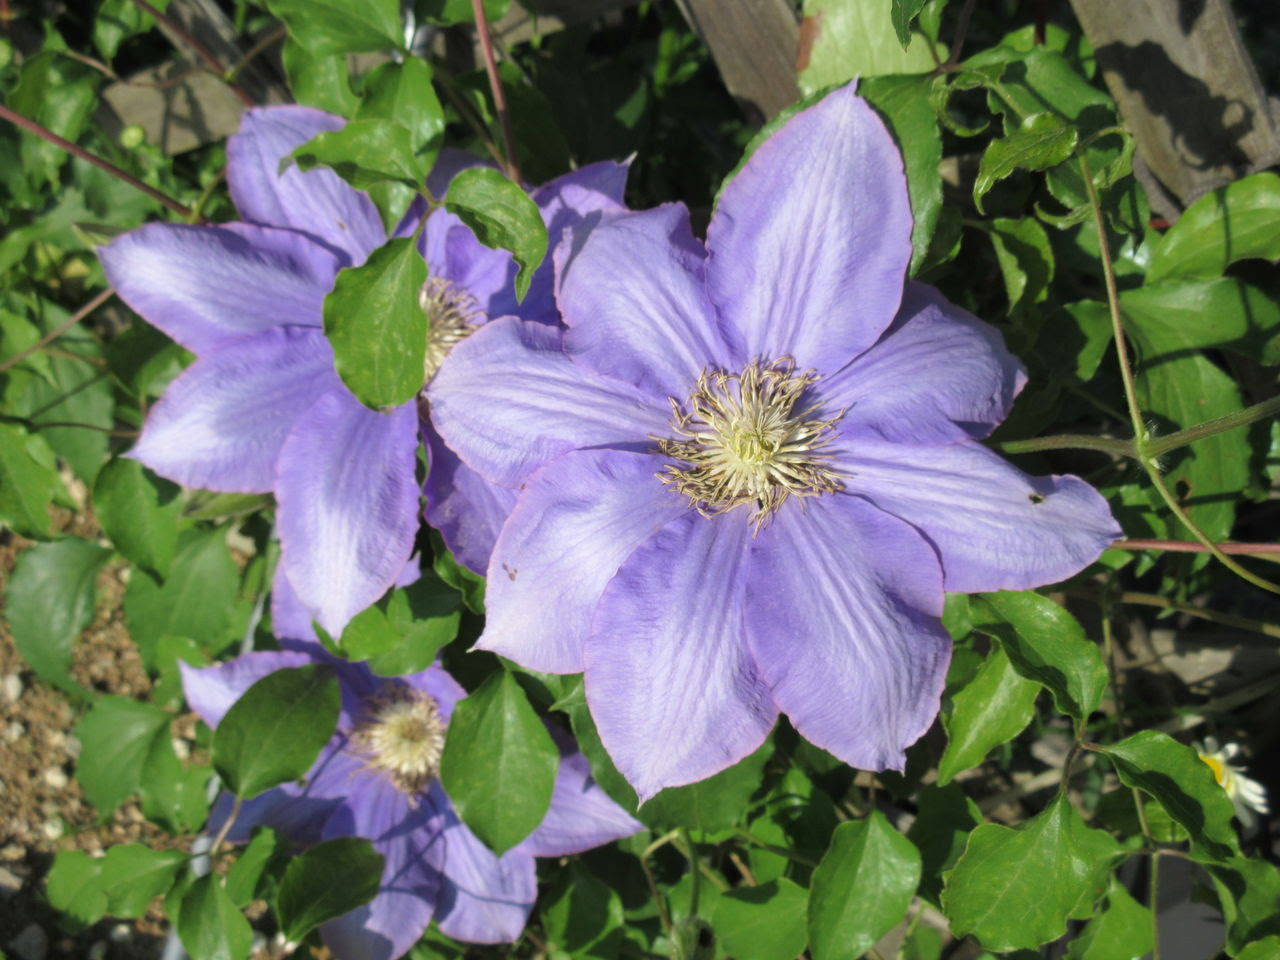 Diy Heaven5月の花13種類 お見事です